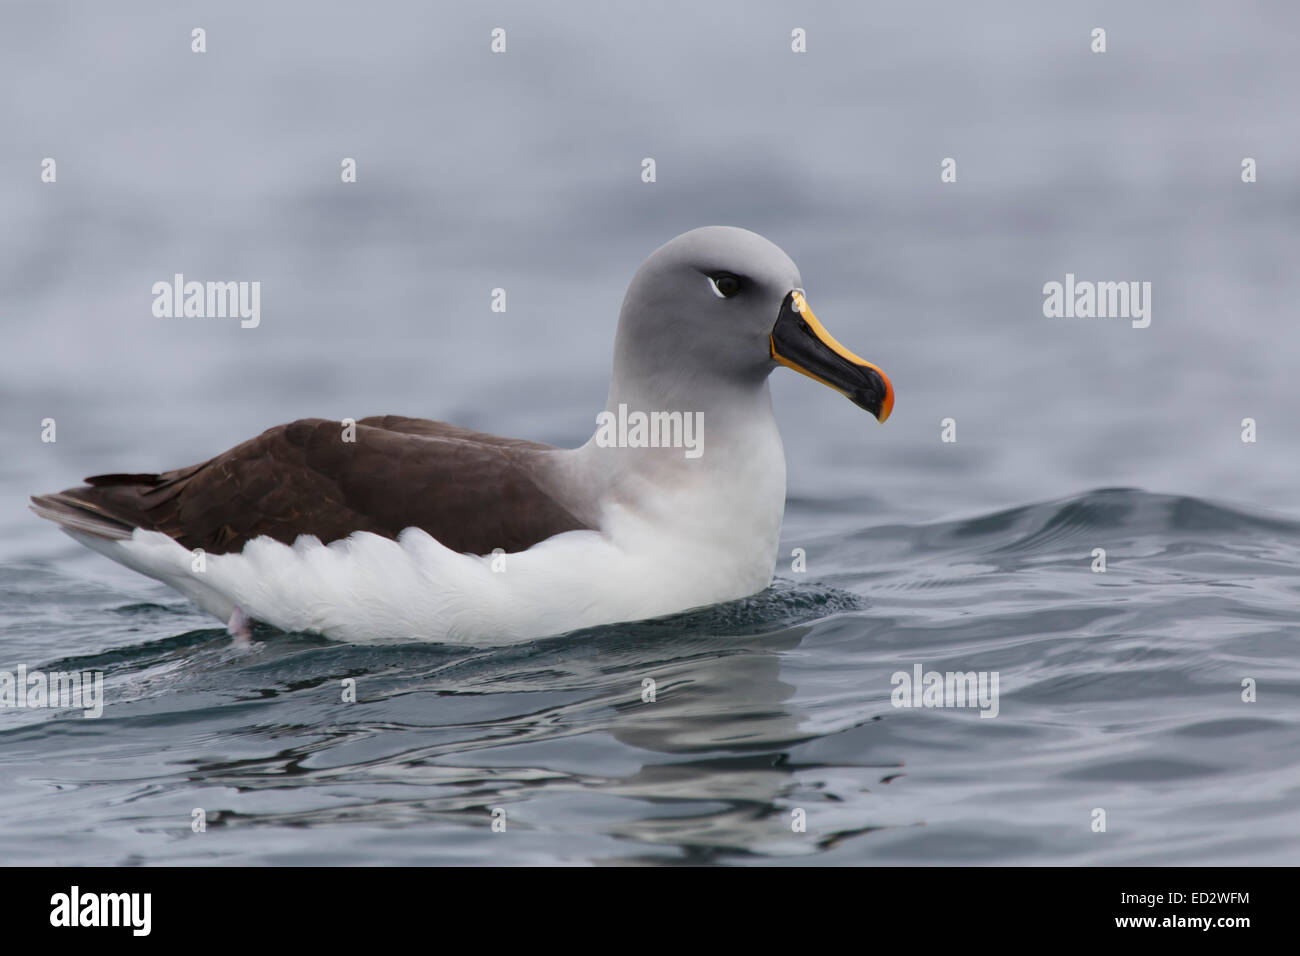 Grey-headed albatross (Thalassarche chrysostoma), Cooper Bay, South Georgia, Antarctica. - Stock Image